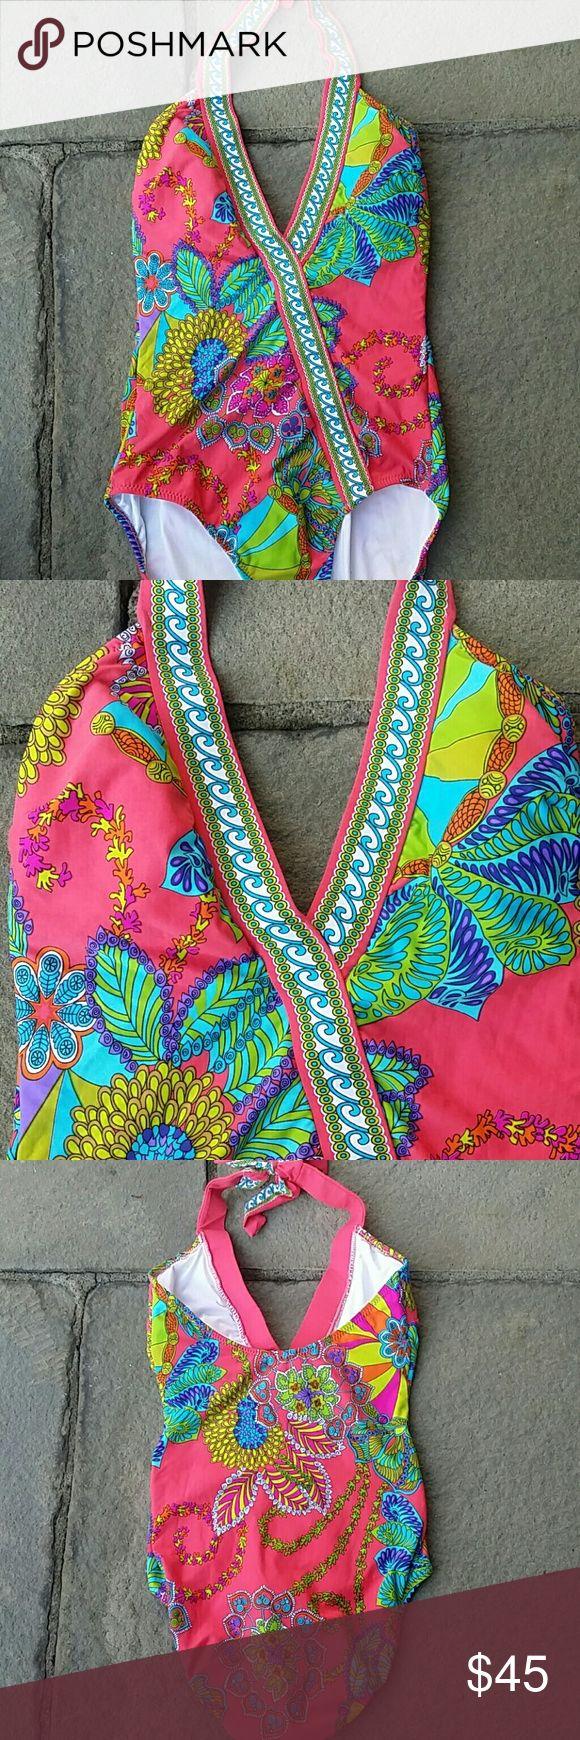 Trina turk multi color one piece v neck swimsuit Vibrant tropical design one piece halter swim suit vguc Trina Turk Swim One Pieces